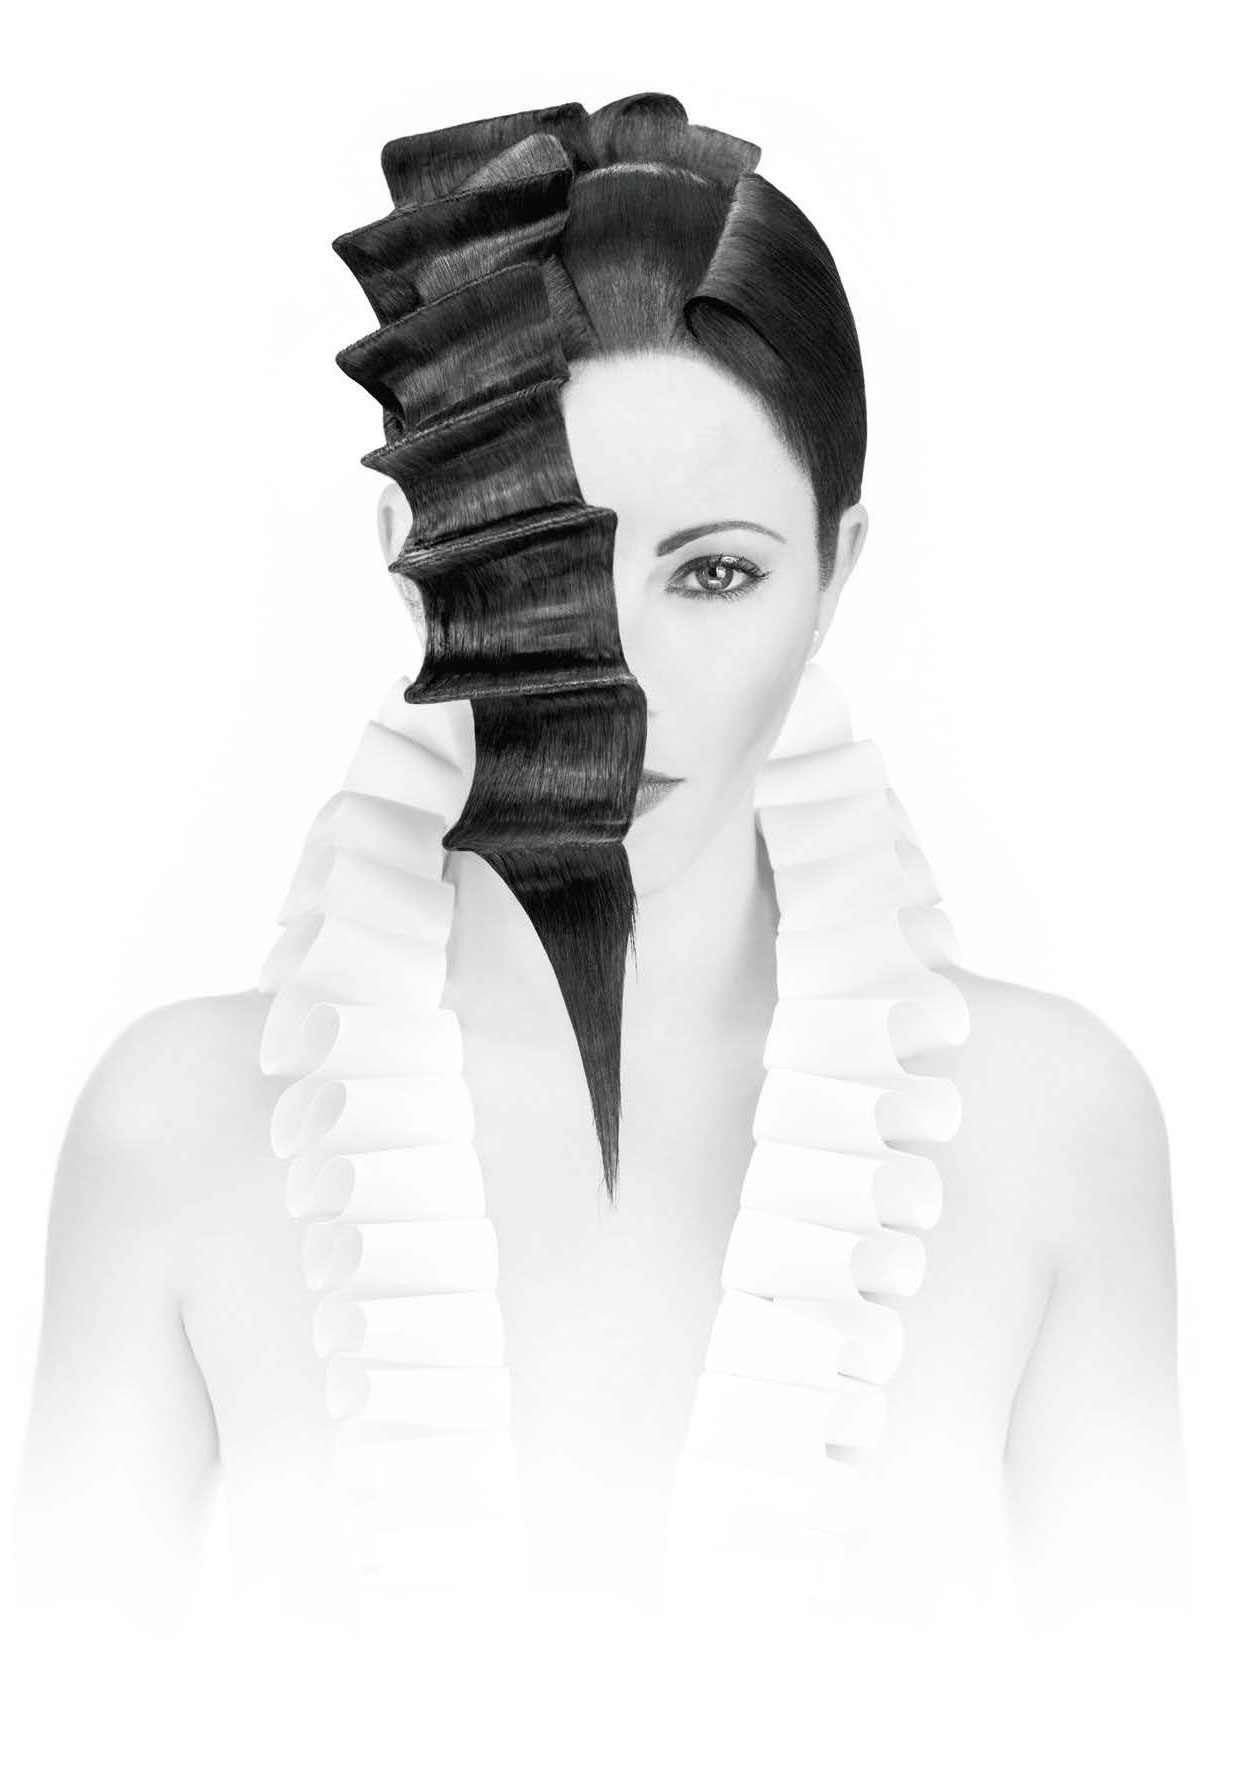 Mode et Beauté © Gaétan Lecire